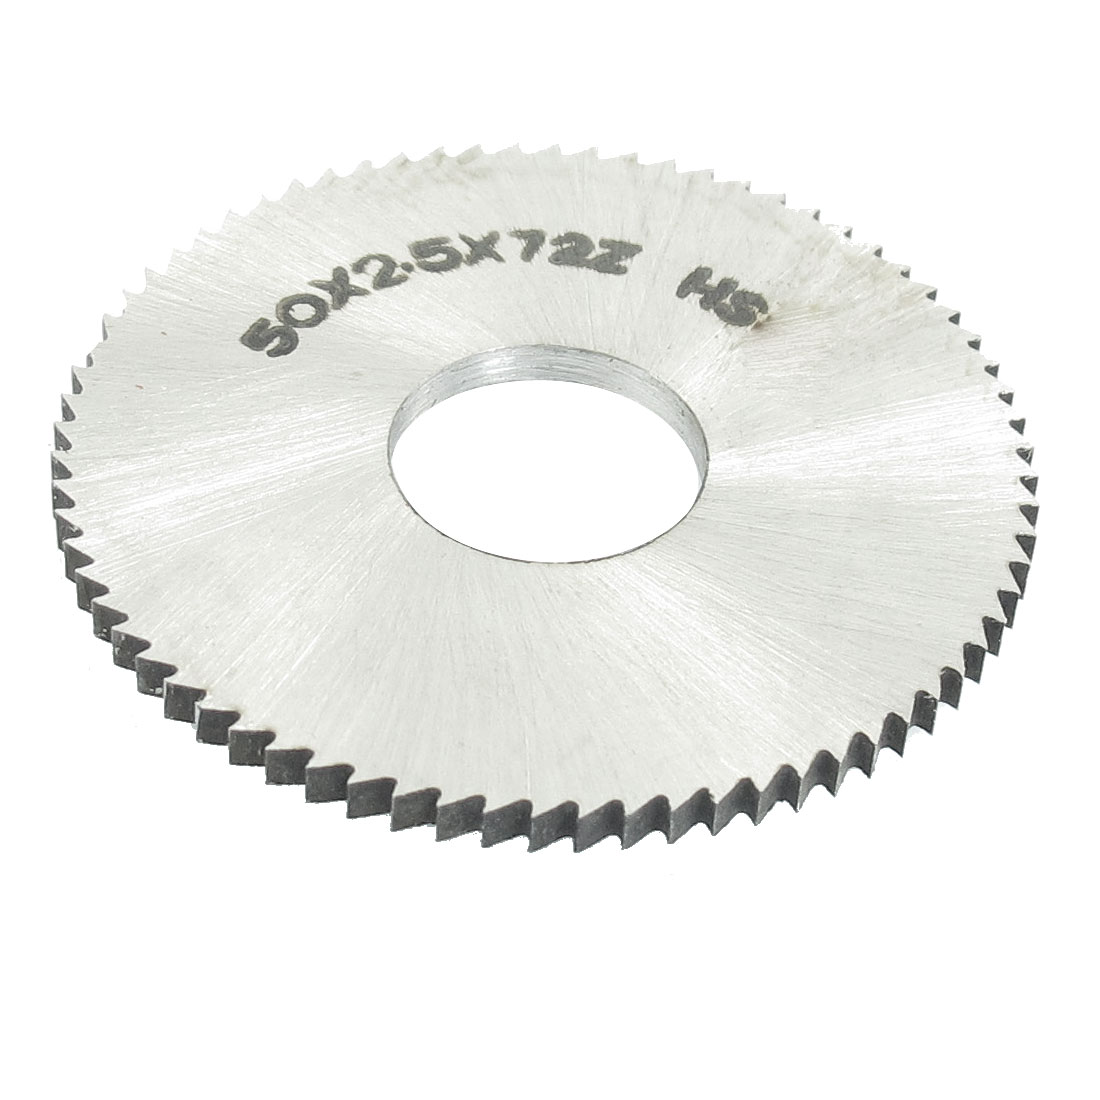 Hand Tool 50mm x 16mm x 2.5mm 72 Peg Teeth HSS Slitting Saw